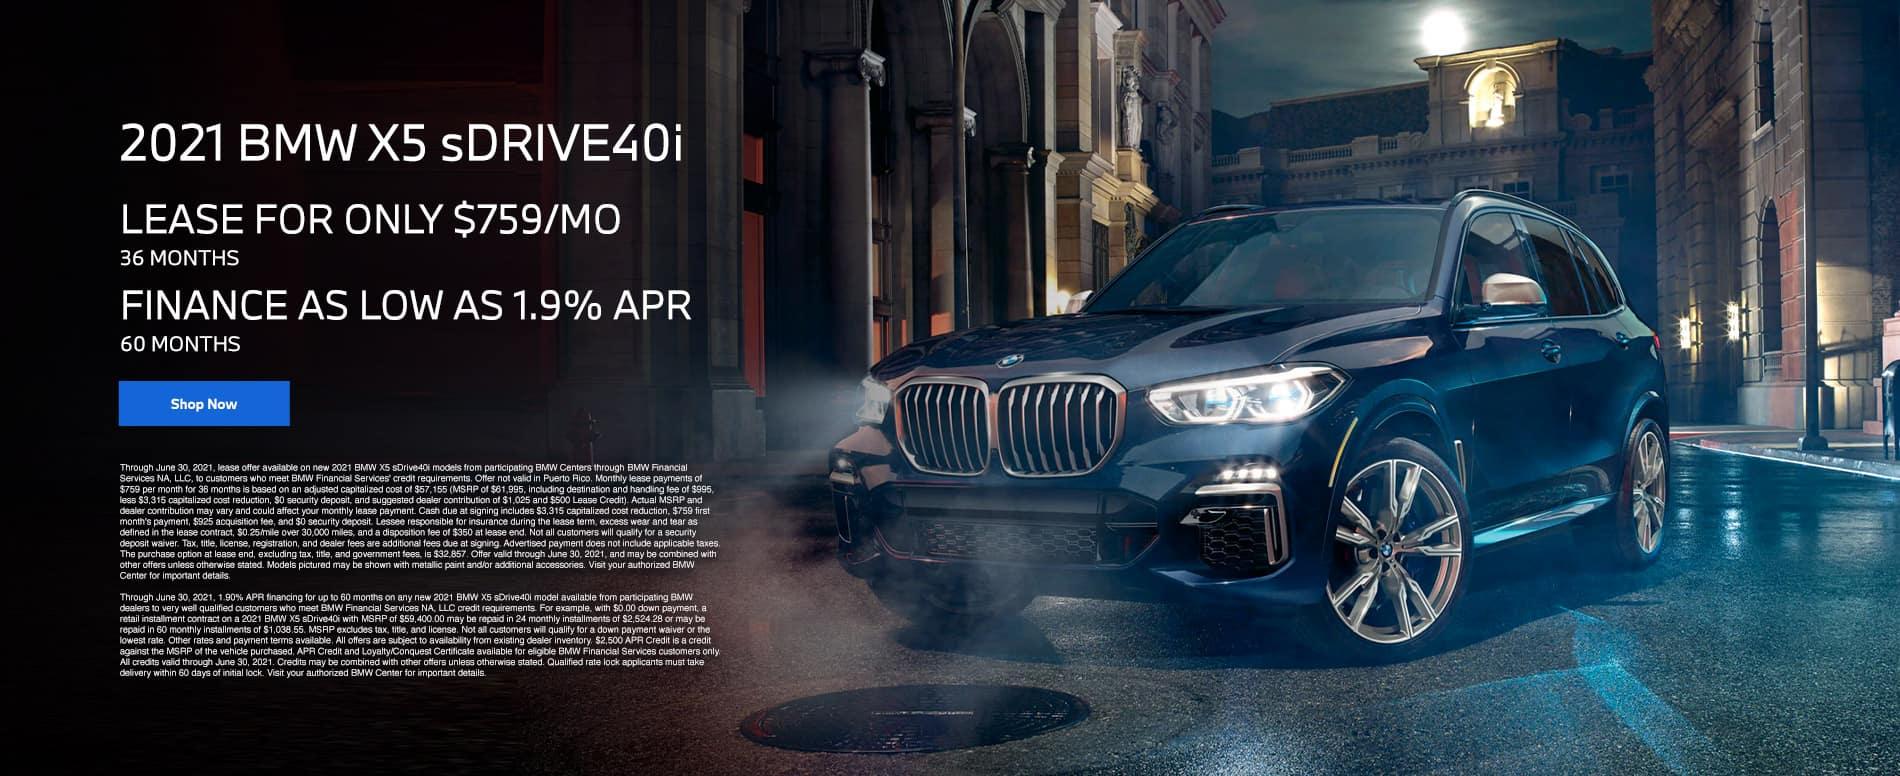 BMW X5 Offer